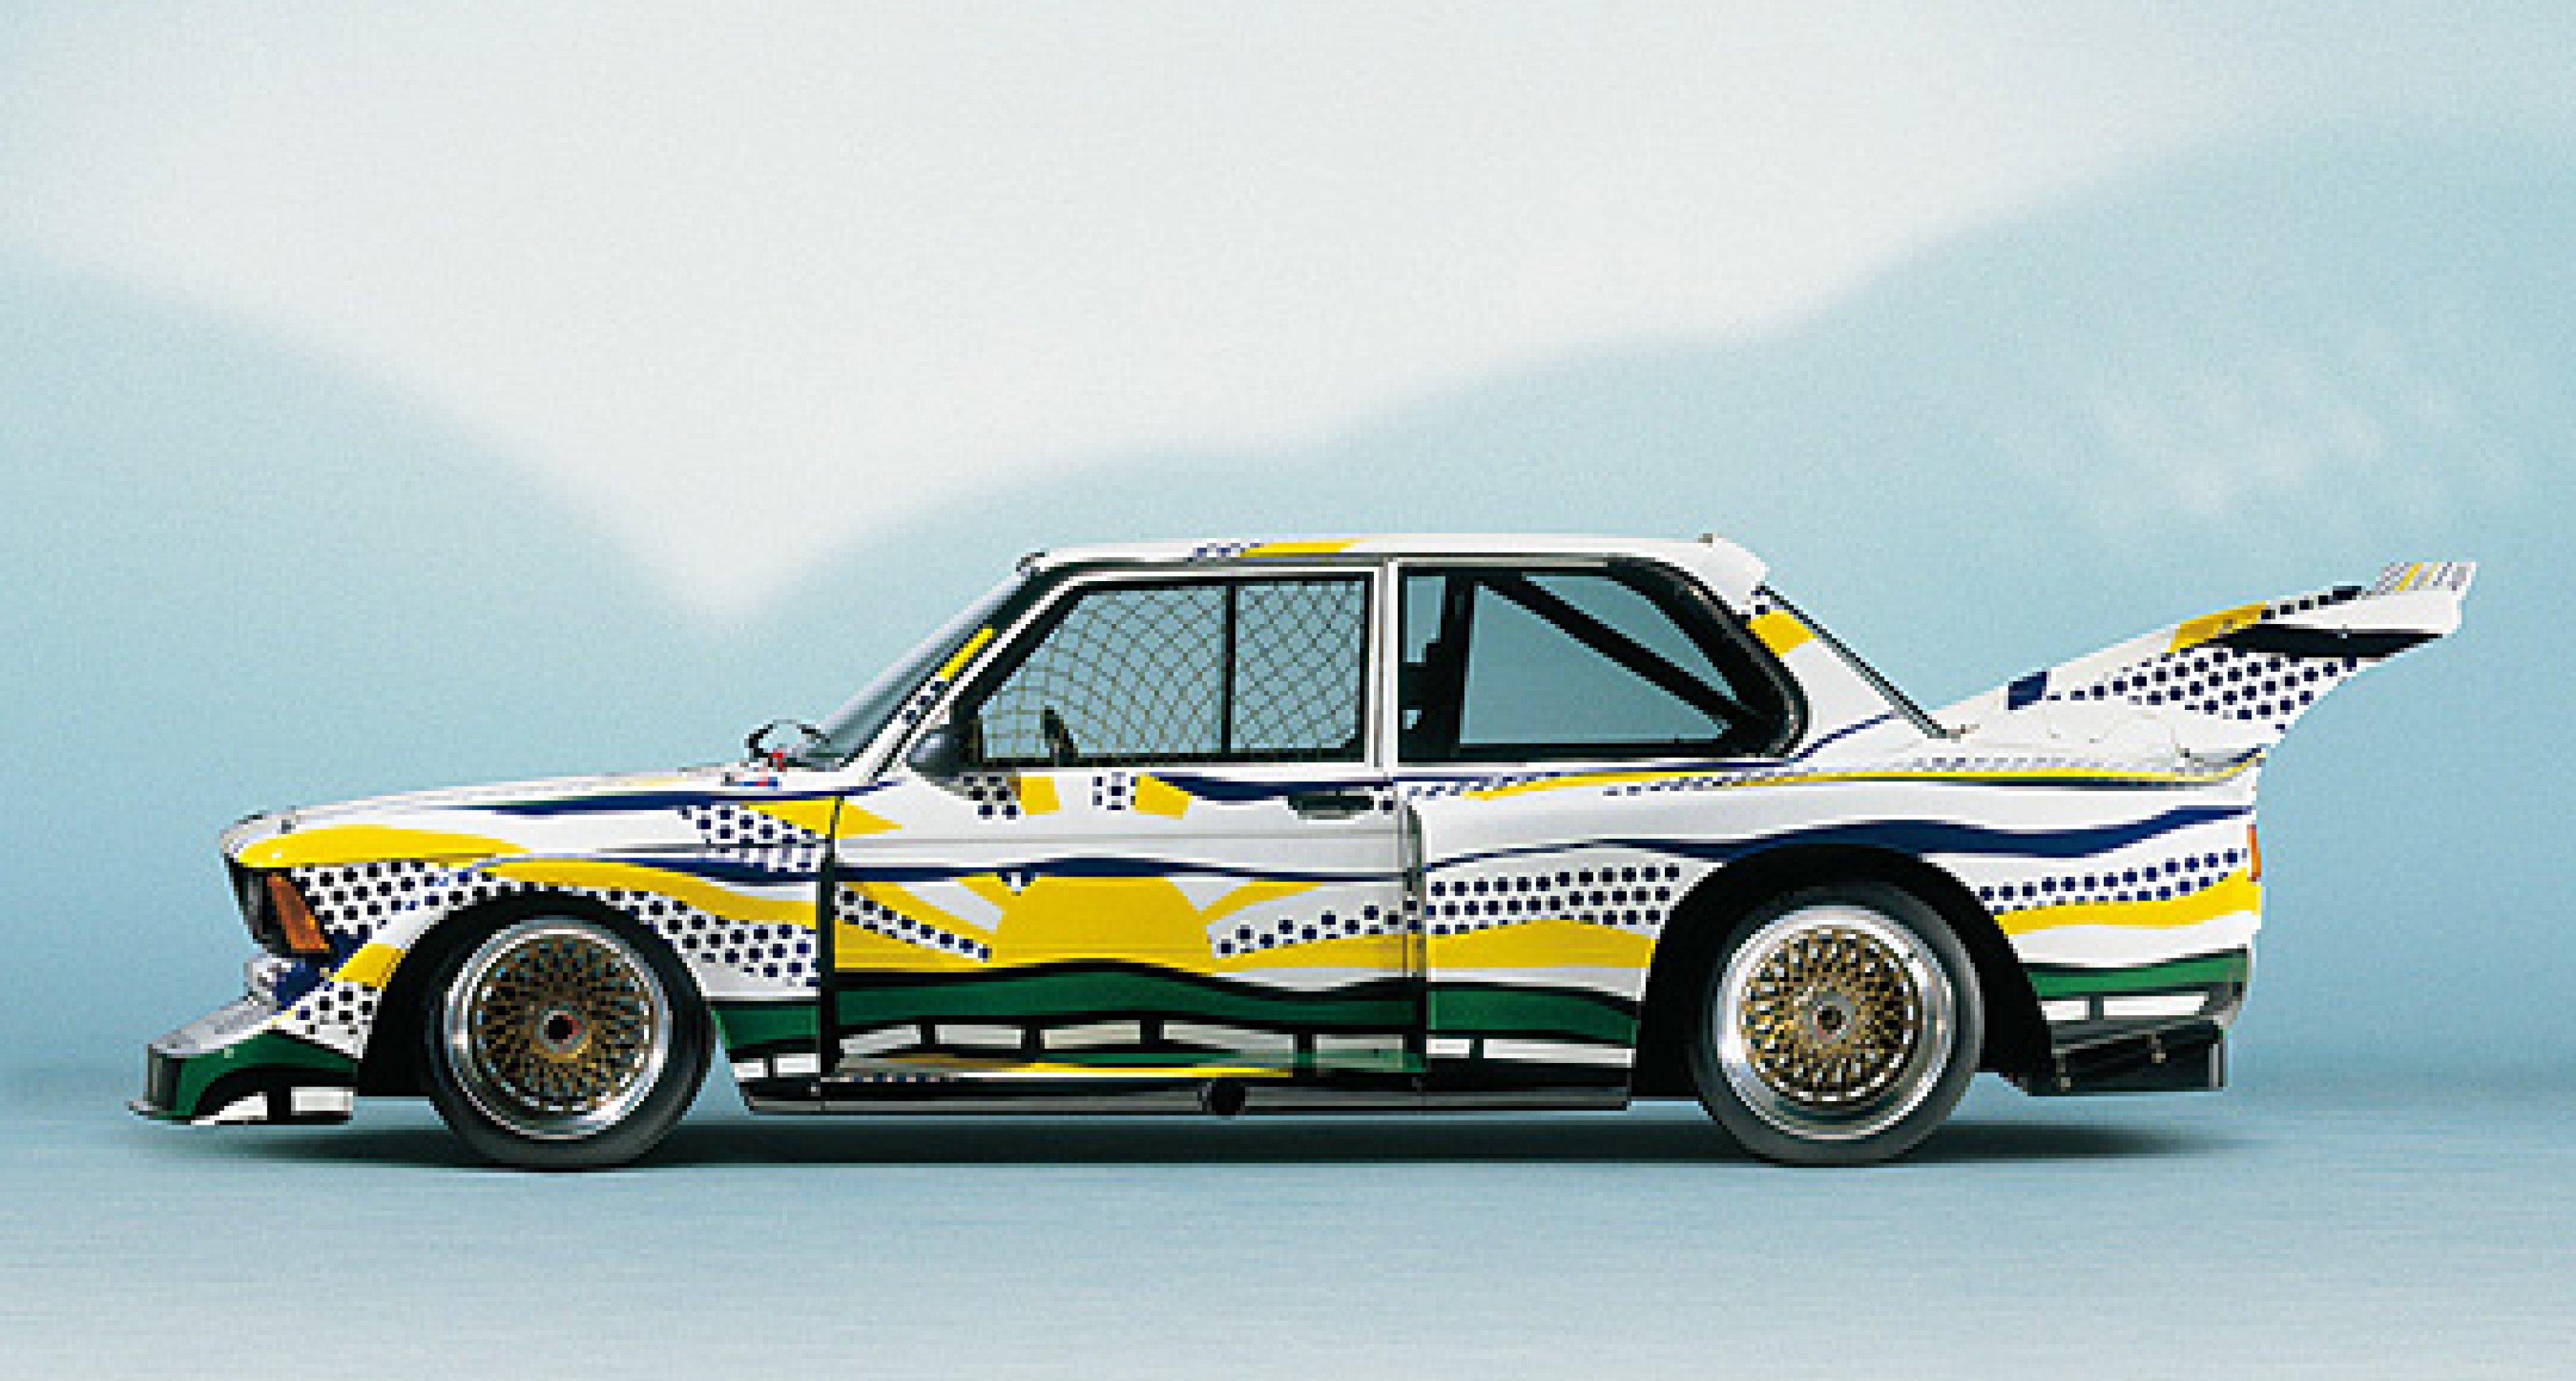 BMW Art Cars: Gesamtschau im BMW Museum